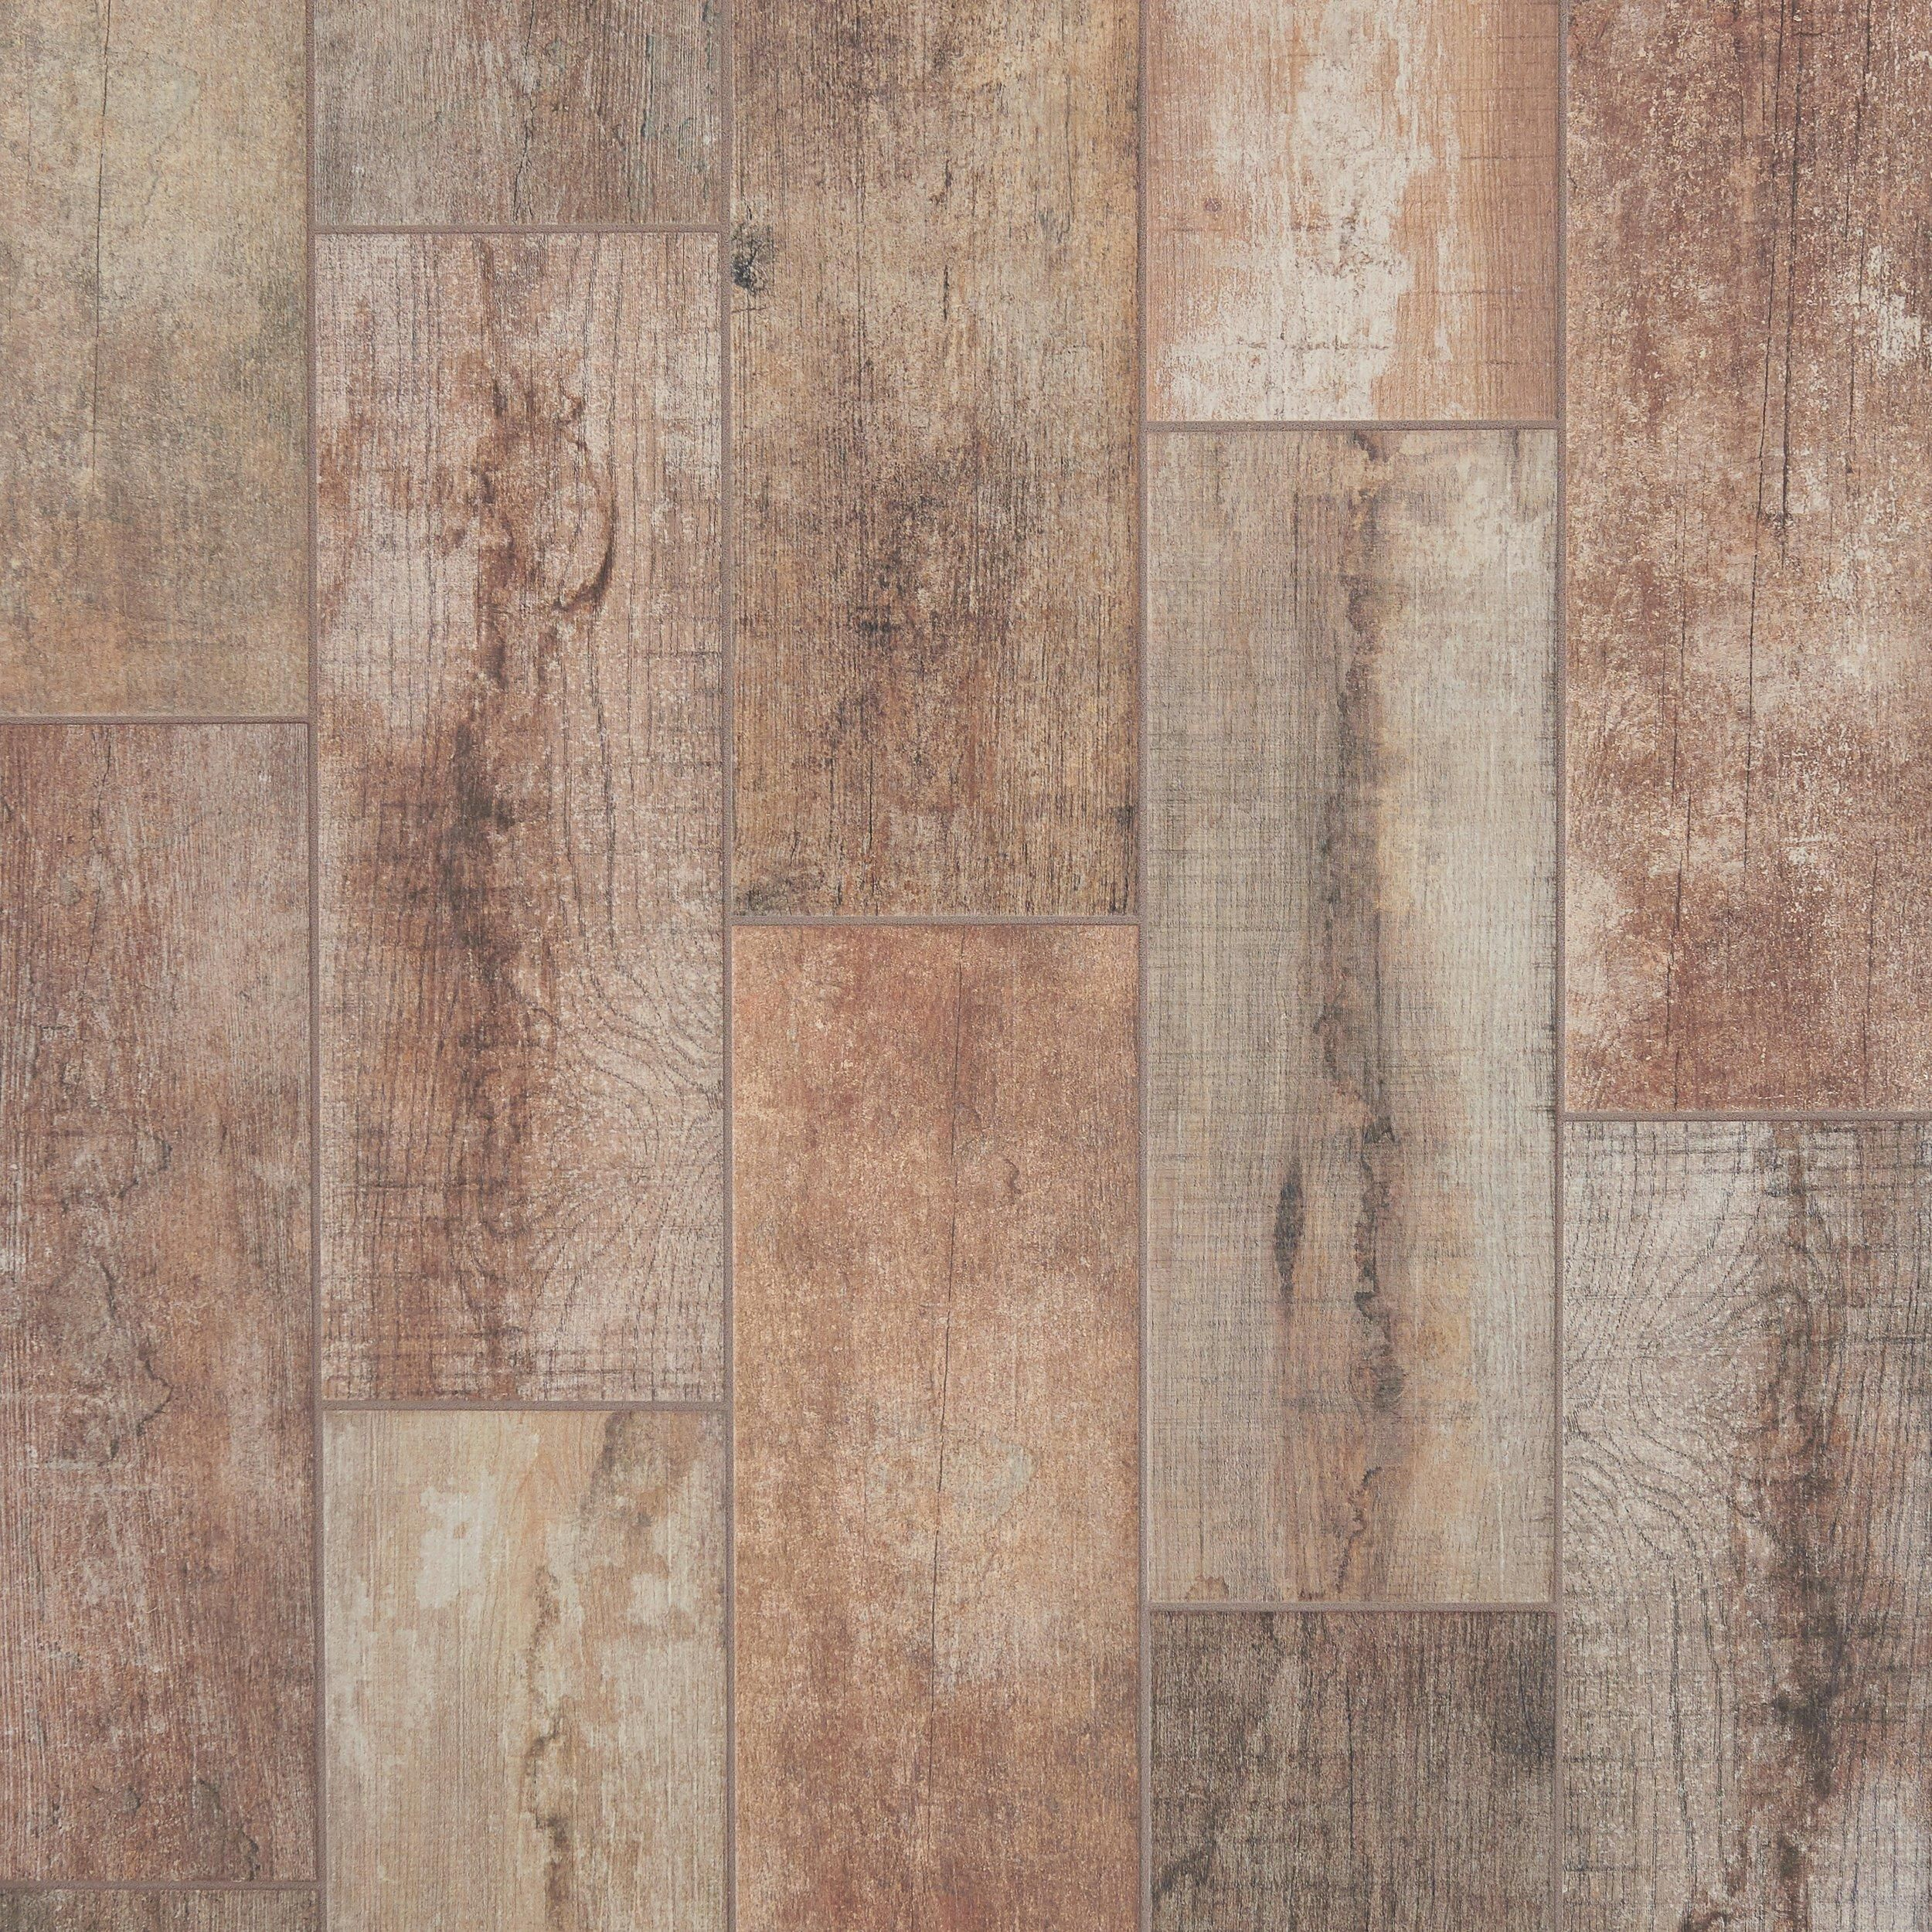 Julyo Wood Plank Ceramic Tile in 2020 Wood look tile